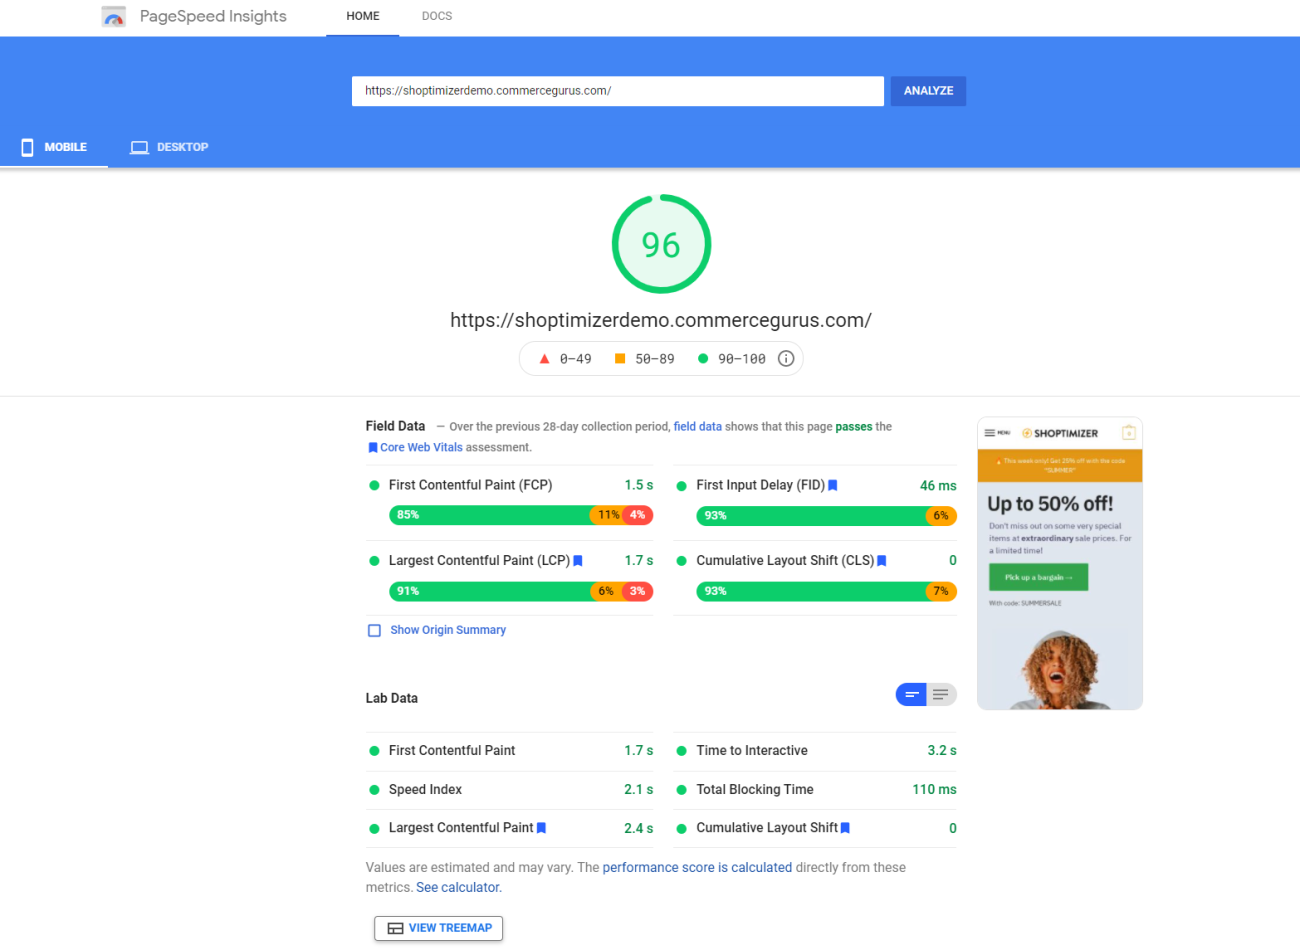 Shoptimizer PageSpeed test